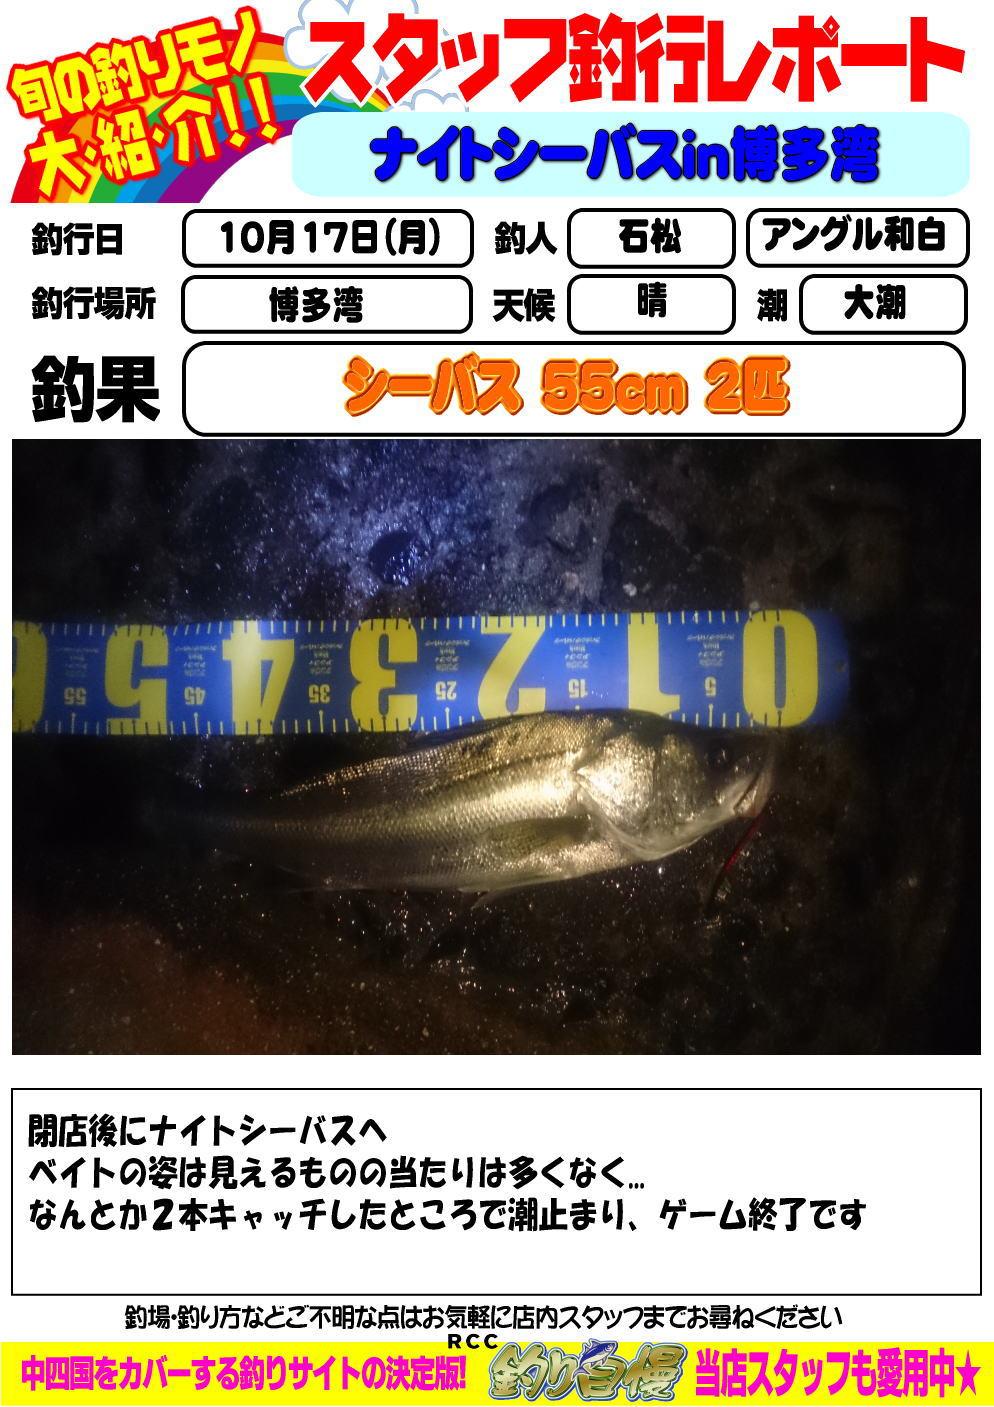 http://www.e-angle.co.jp/shop/blog/image.jpg%E7%9F%B3%E6%9D%BE.jpg